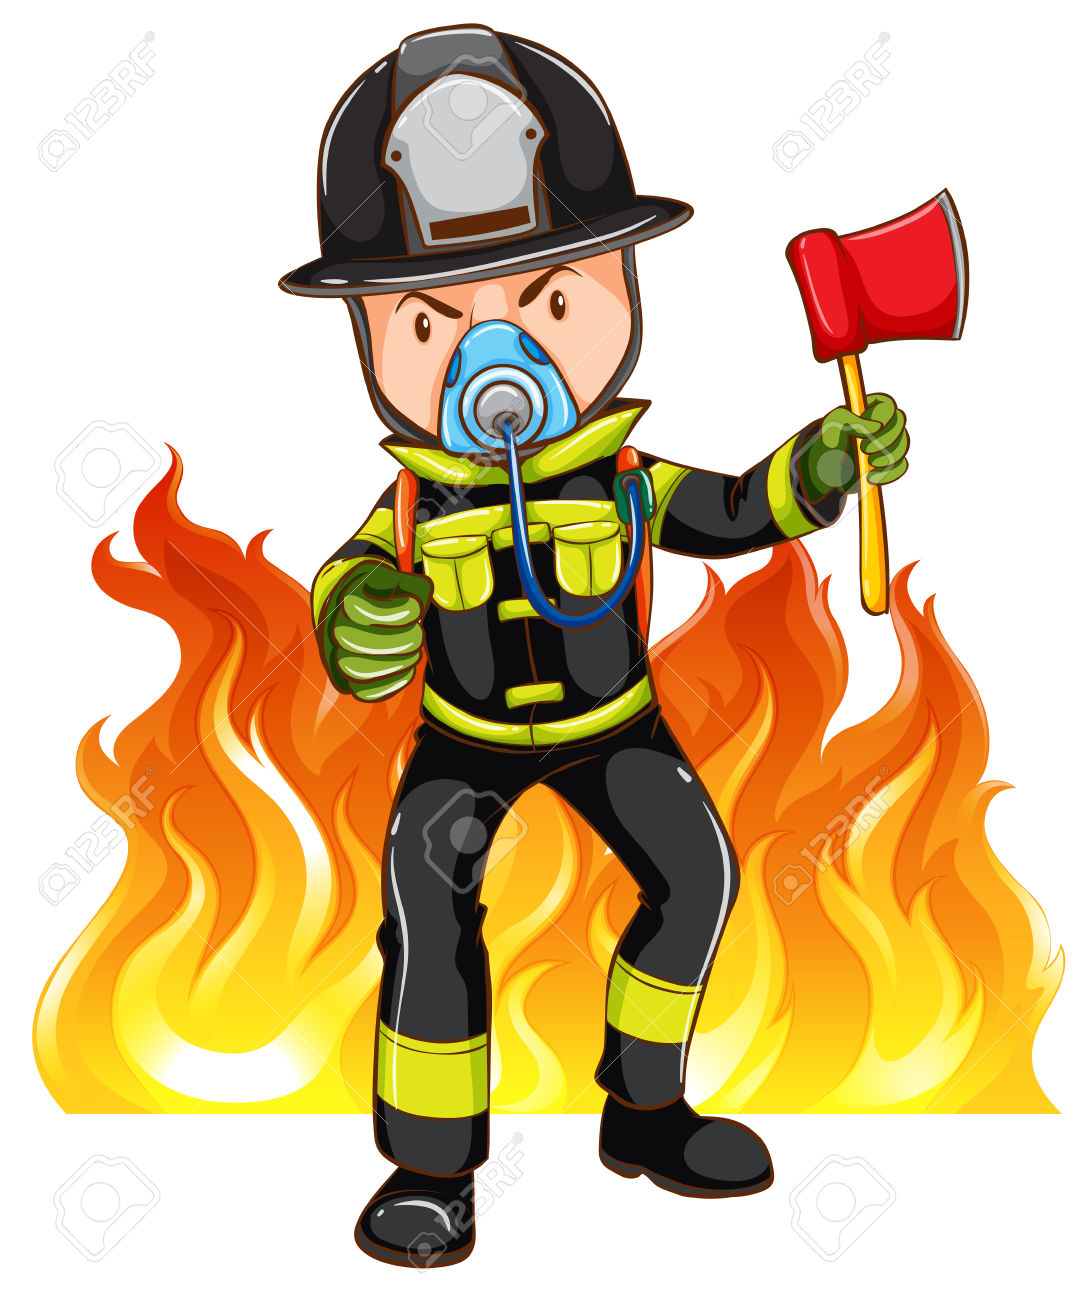 1087x1300 Firemen Archives